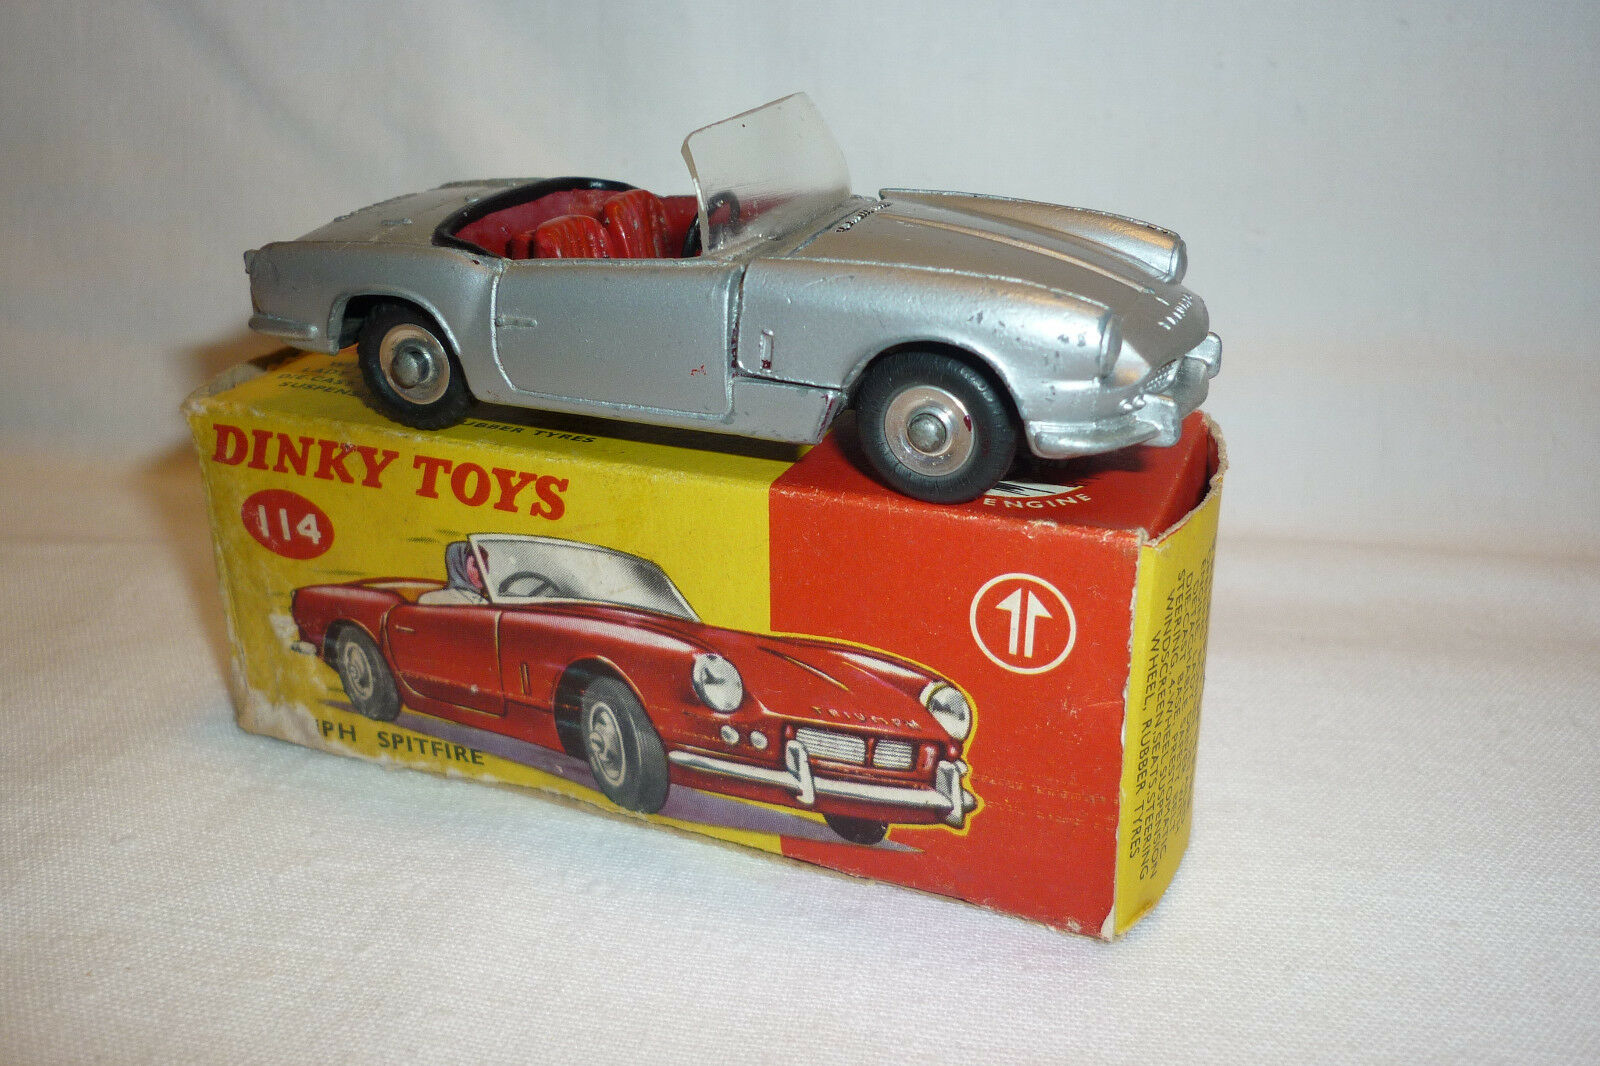 Dinky Toys - Vintage Metal Model - Triumph Spitfire No Replica Sealed (DINKY T